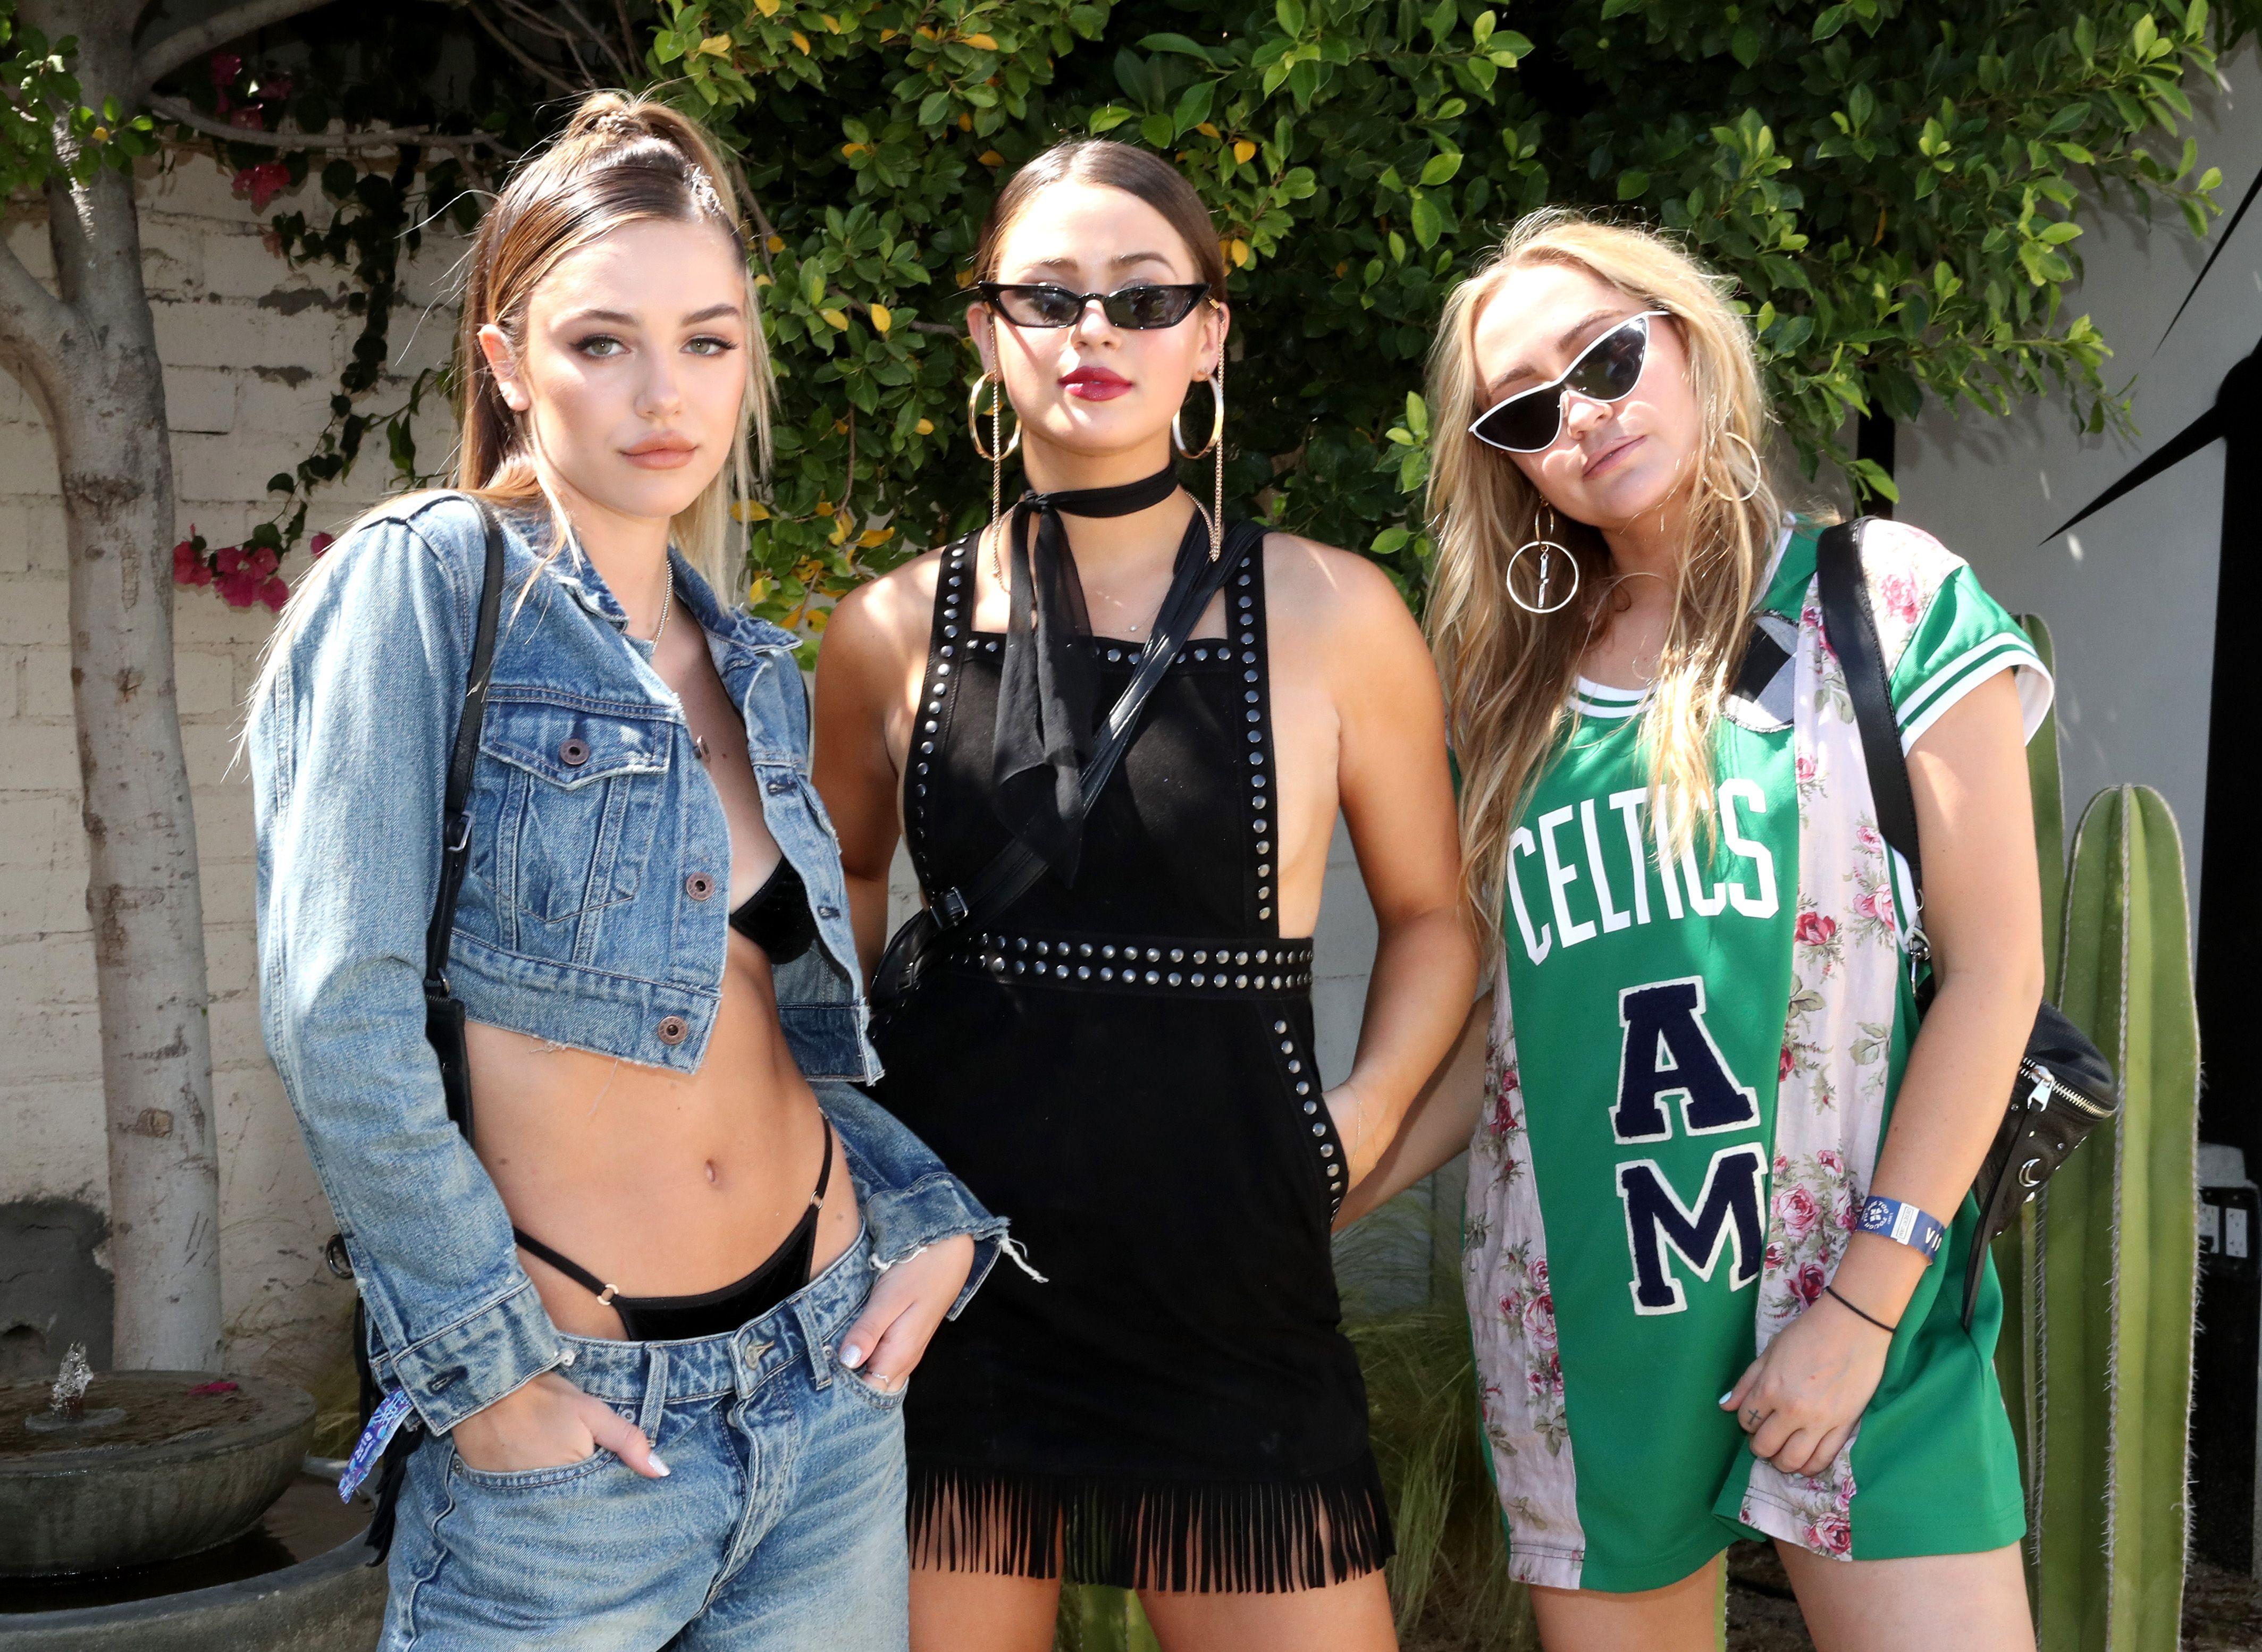 Delilah Belle Hamlin, Ella Angel and Brandi CyrusLucky Desert Jam, Coachella Valley Music and Arts Festival, Palm Springs, USA - 14 Apr 2018